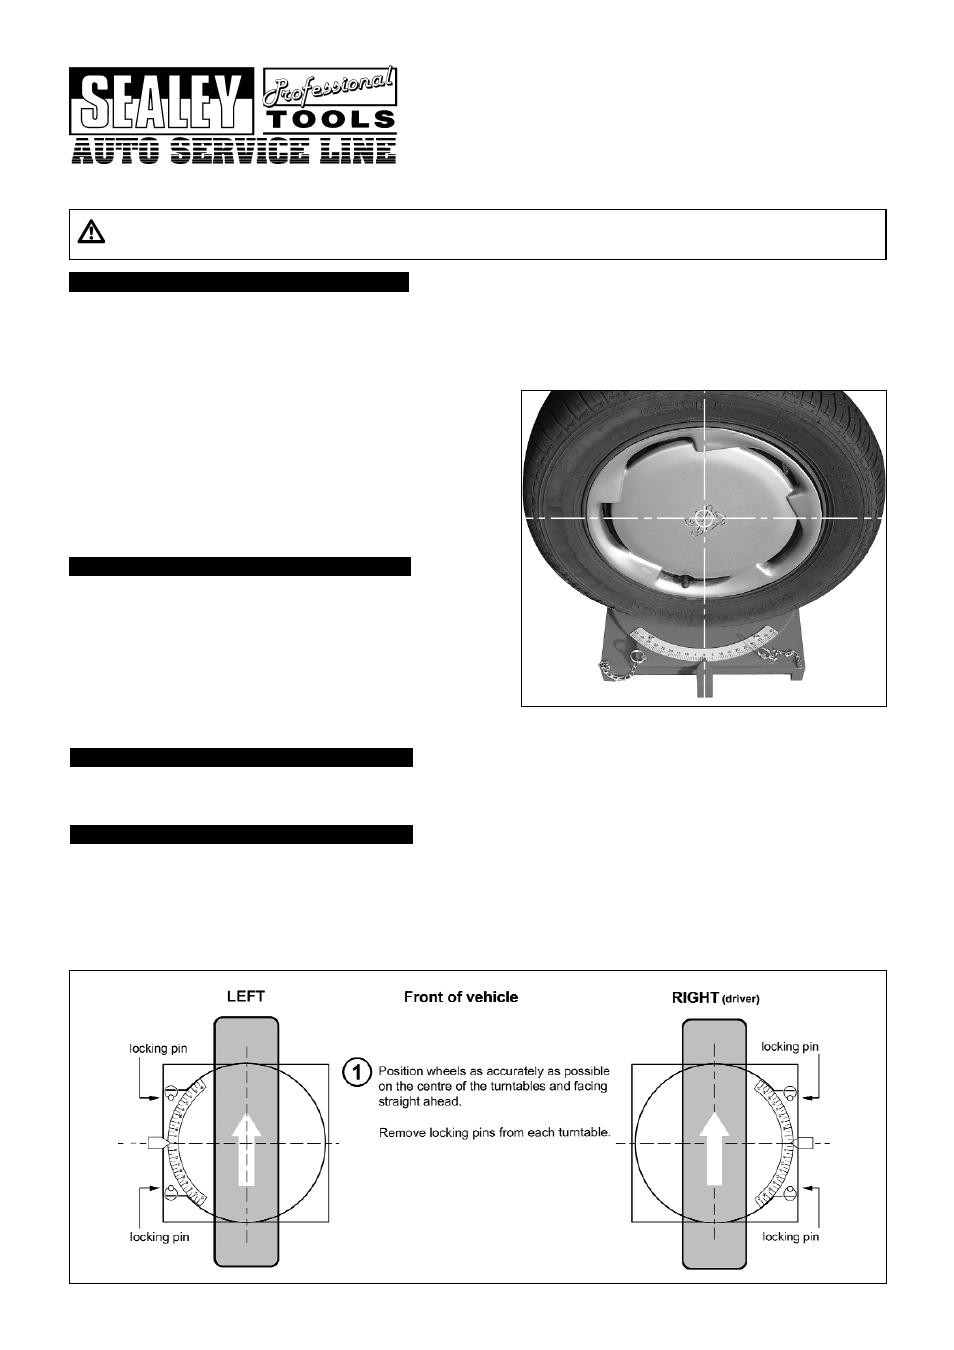 sealey ga44 user manual 2 pages rh manualsdir com Owner S Manual Craftsman 917 Craftsman Snow Blower Parts Manuals